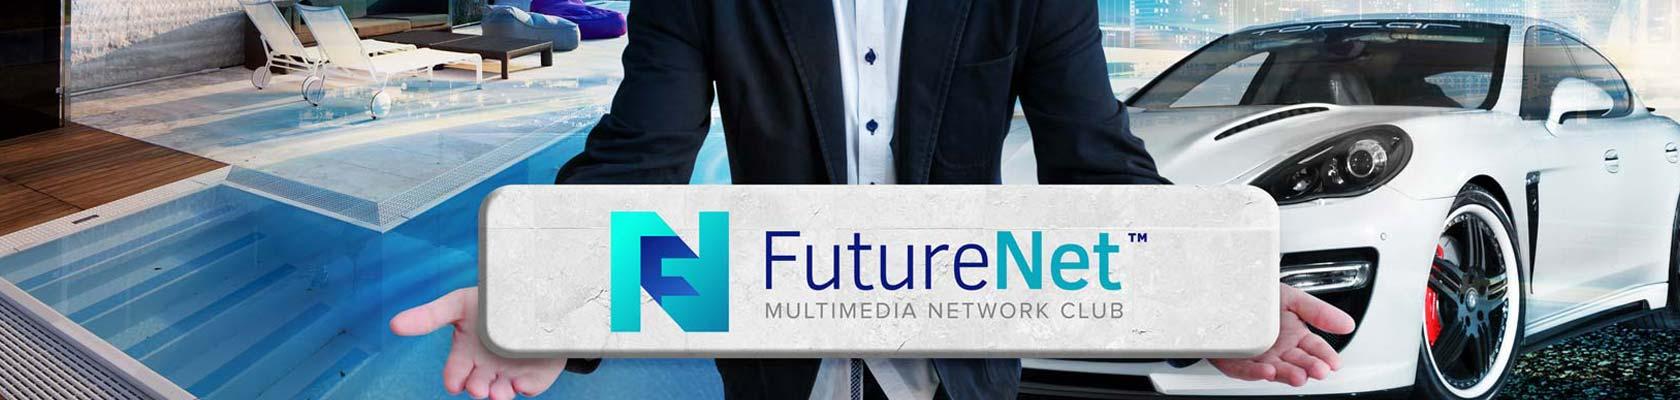 futurenet-in-sinhala